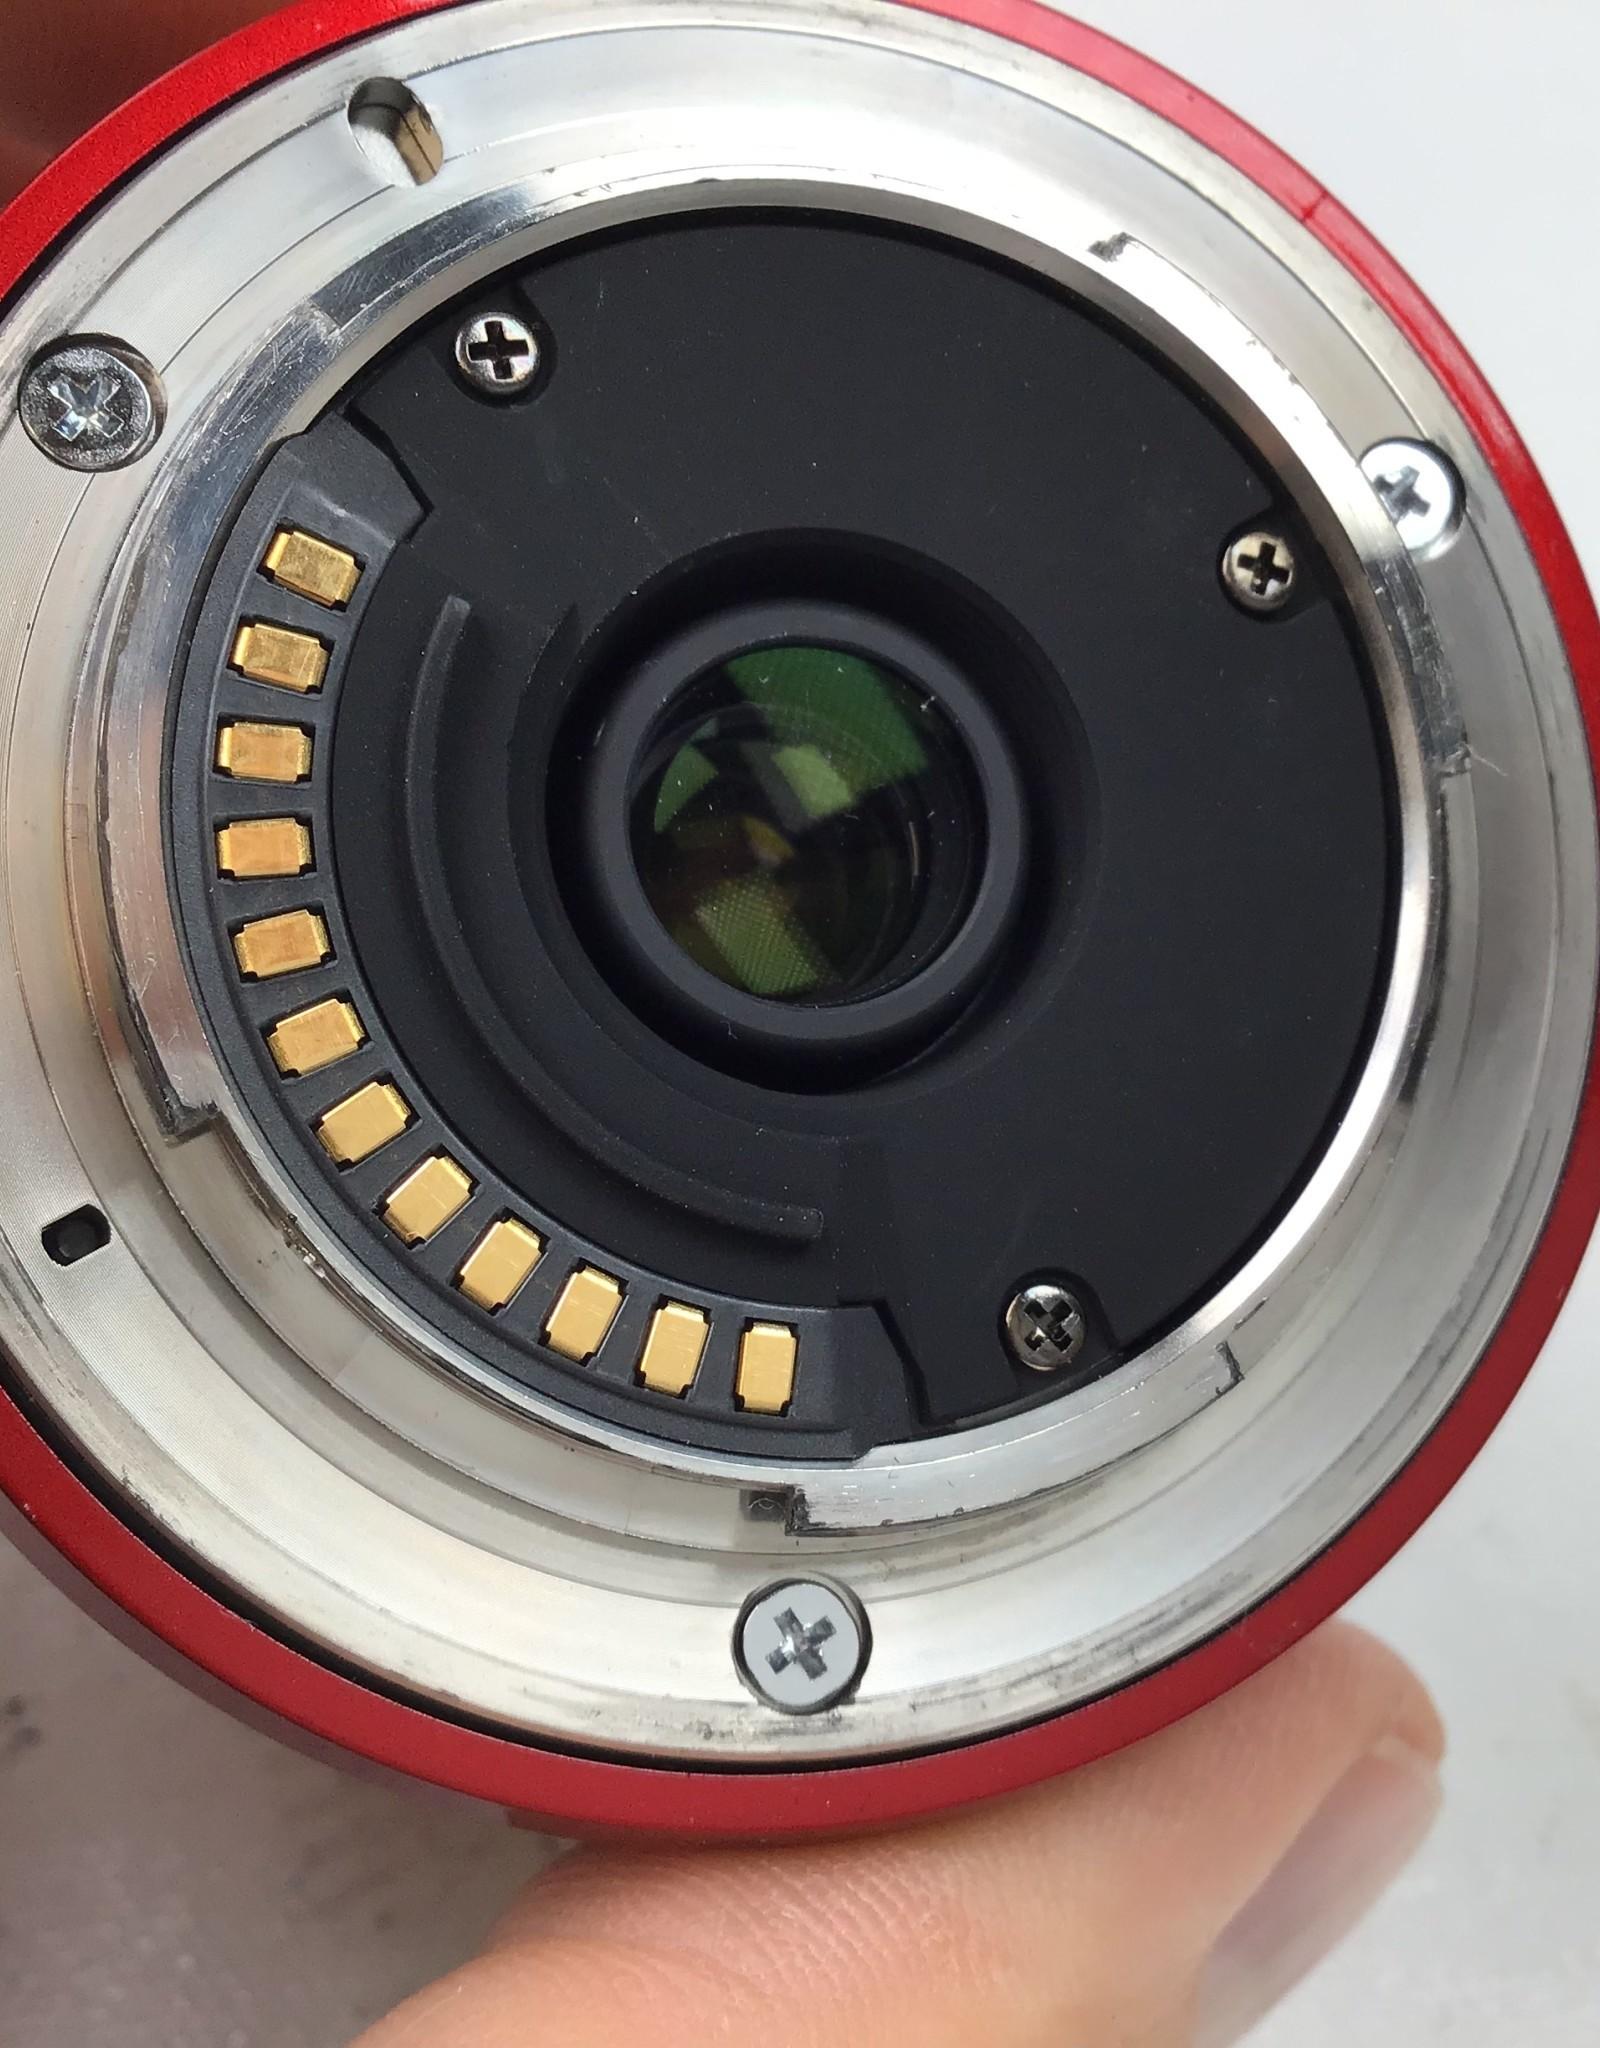 NIKON Nikon 1 30-110mm Lens Used Good